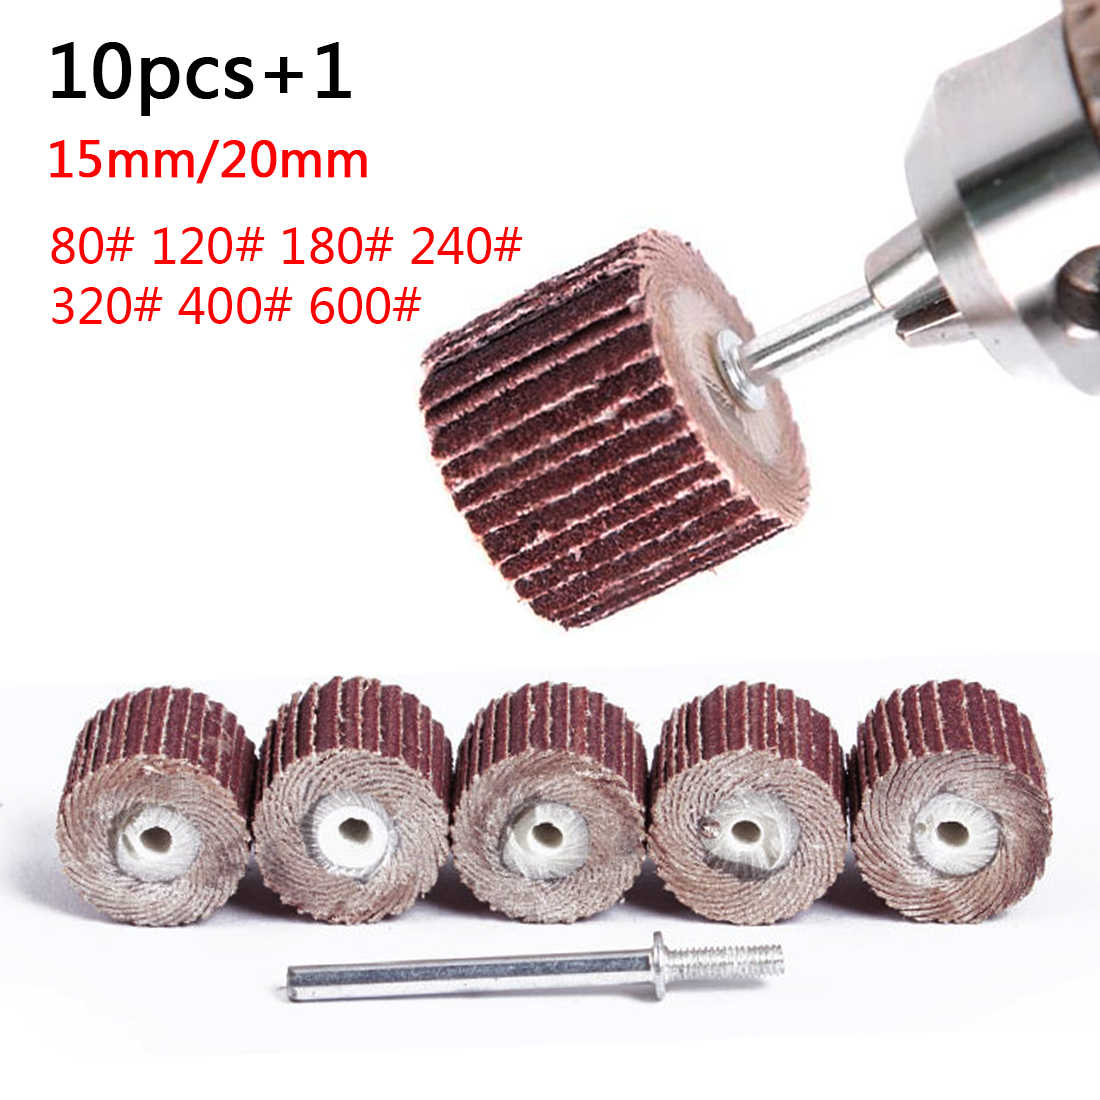 Accesorios Dremel, ruedas para lija, discos de lijado, obturador, herramienta rotativa, 10 Uds. 10-12mm